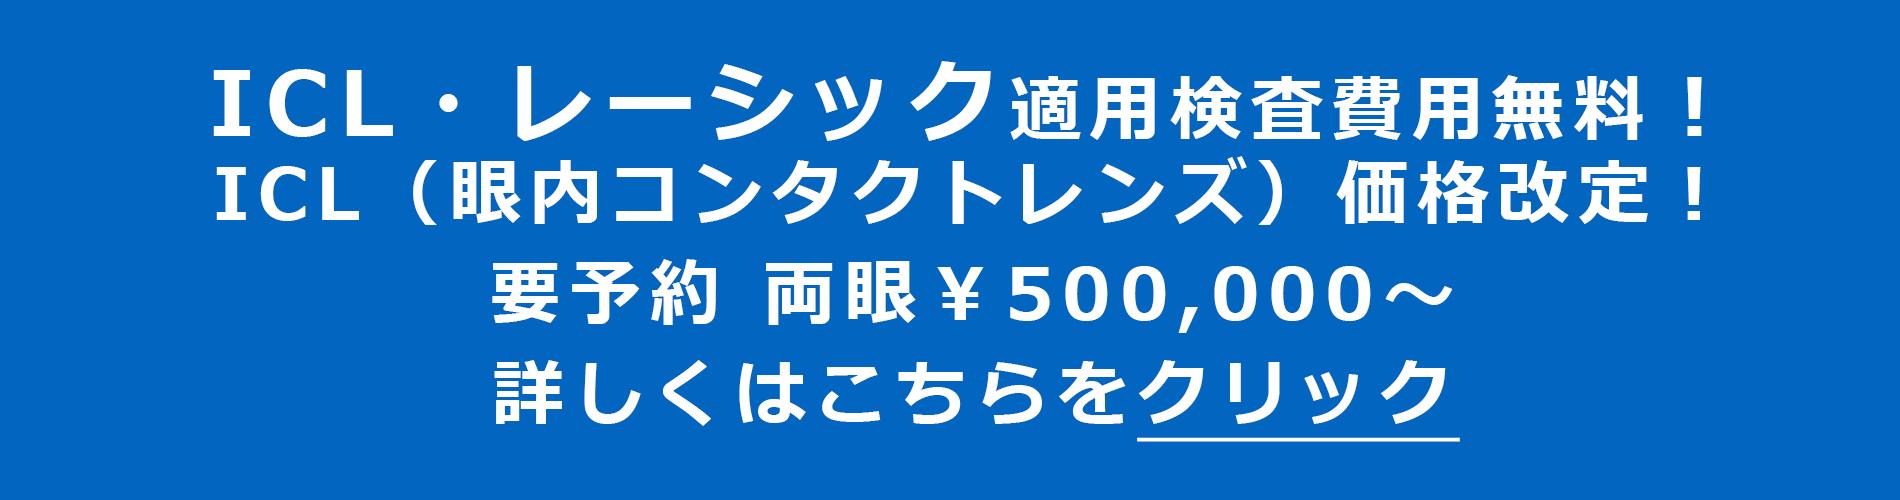 ICL・レーシック適用検査無料